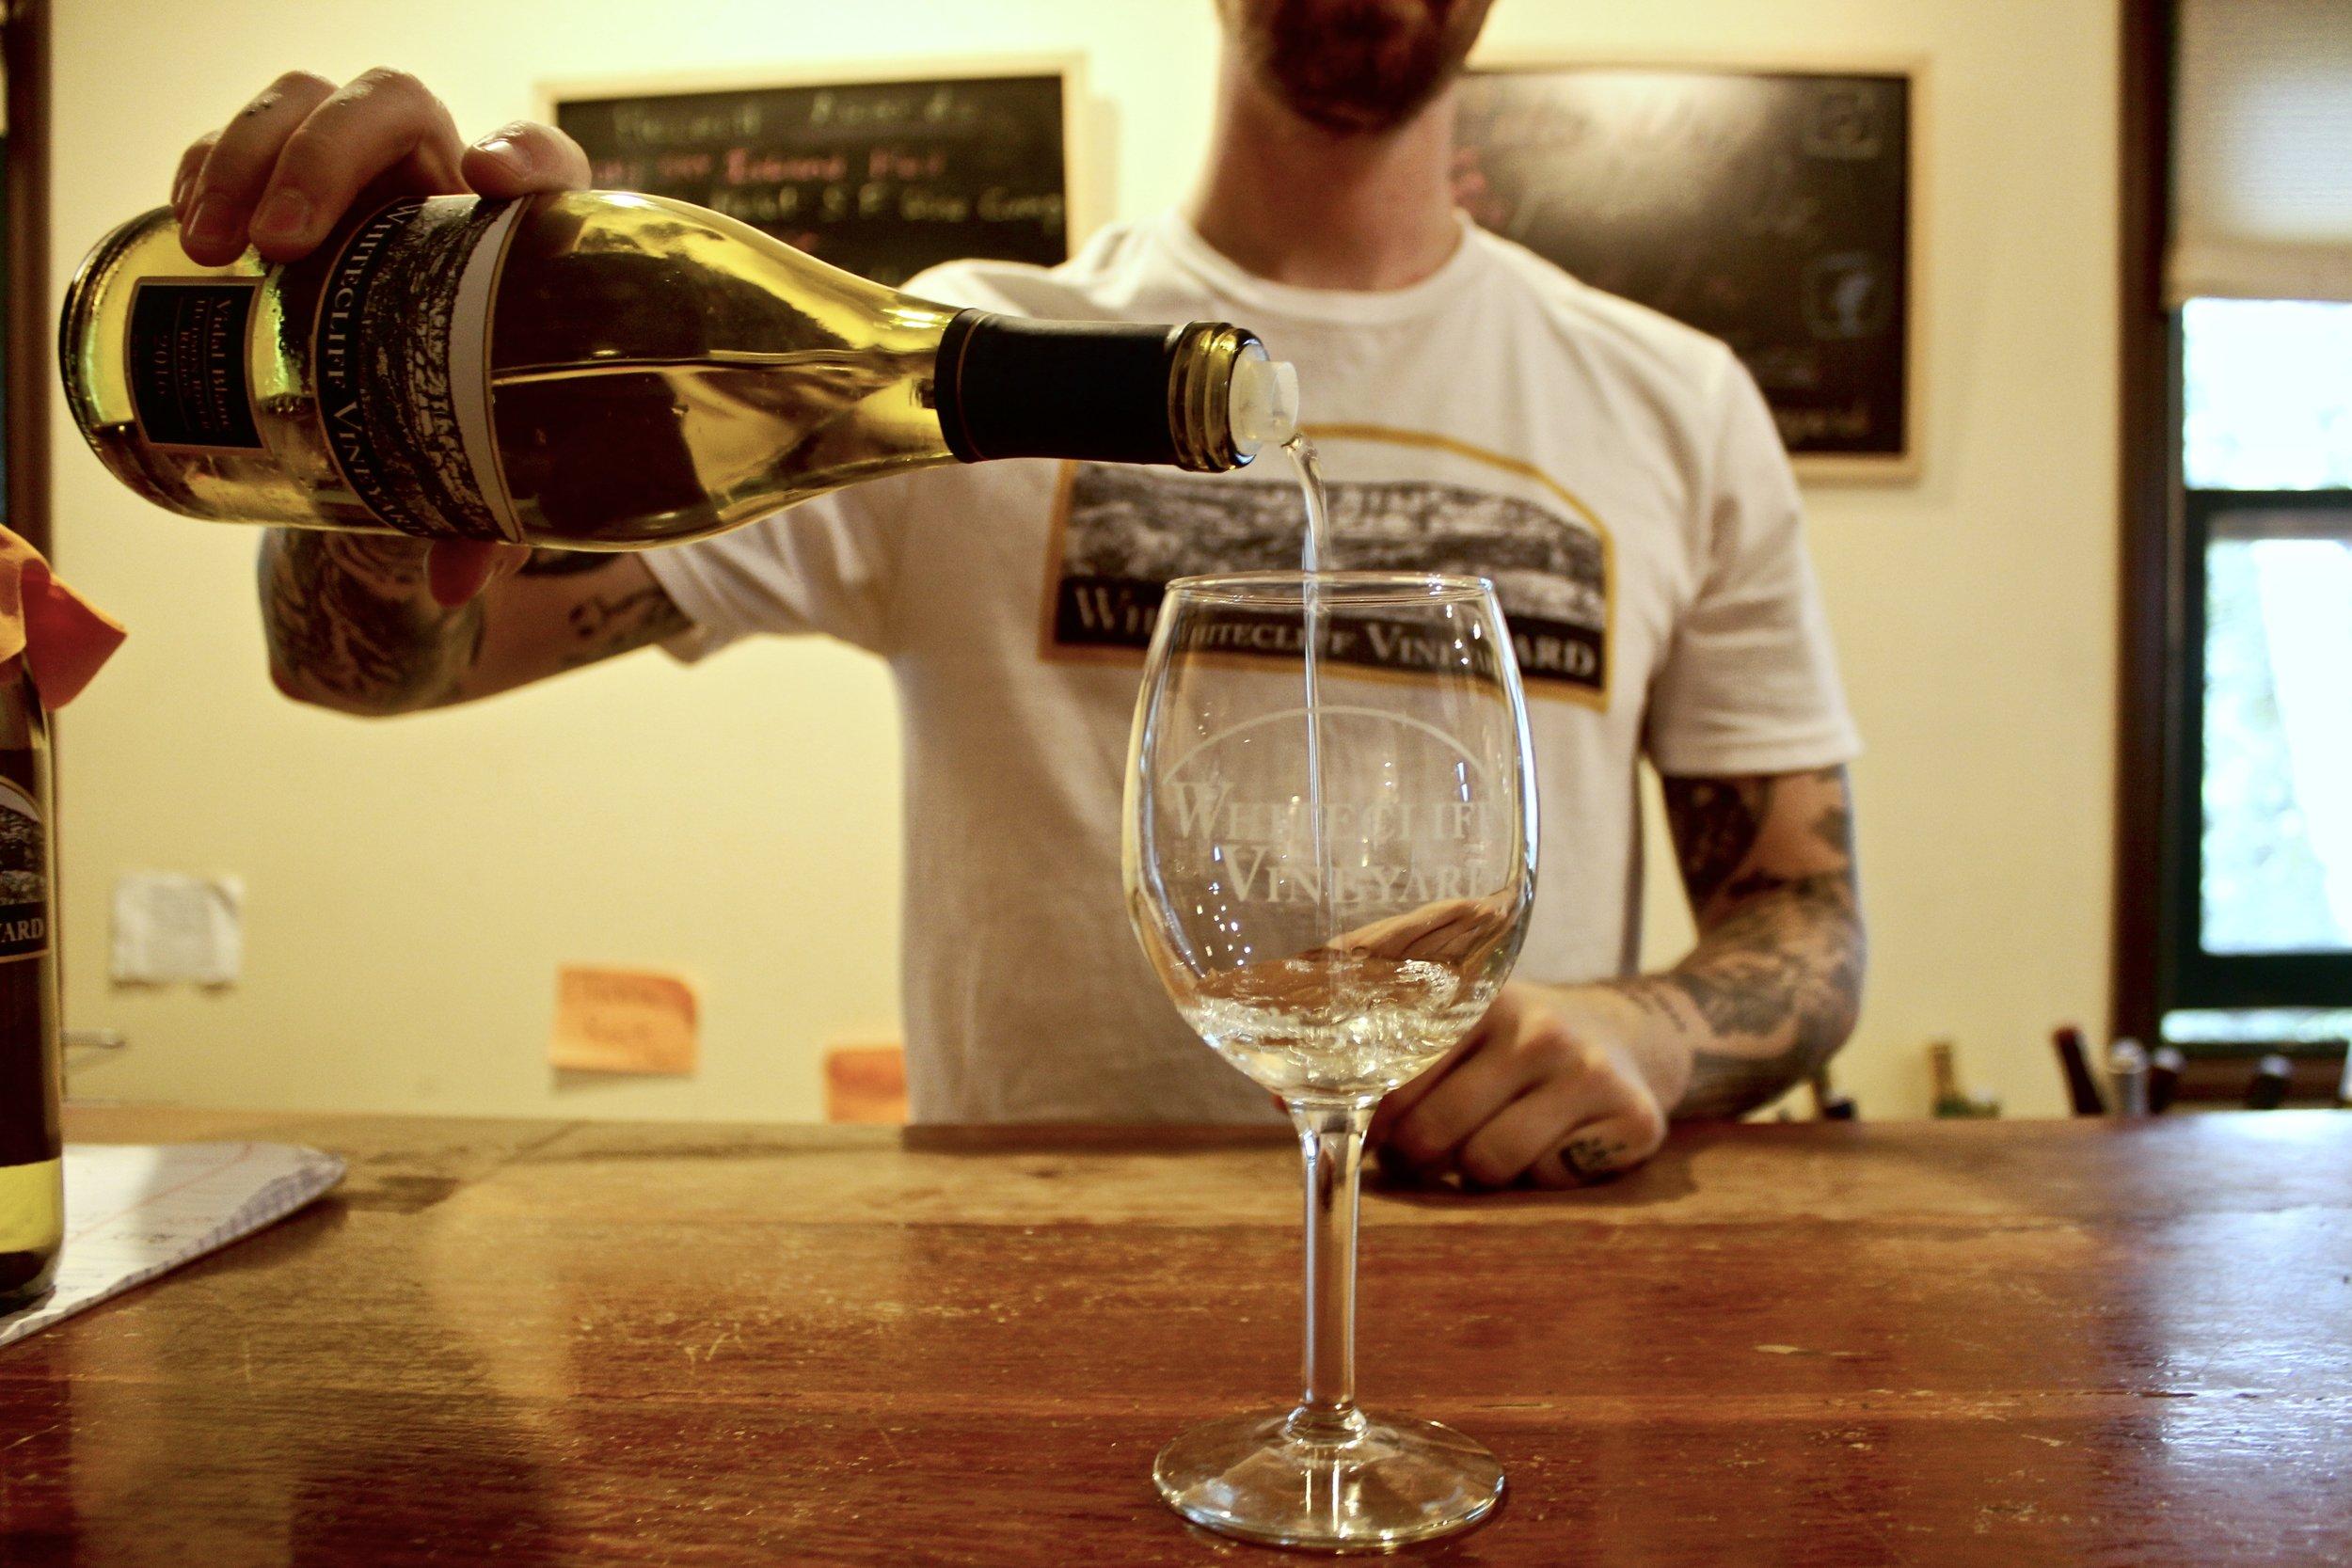 Tasting of the Vidal Blanc